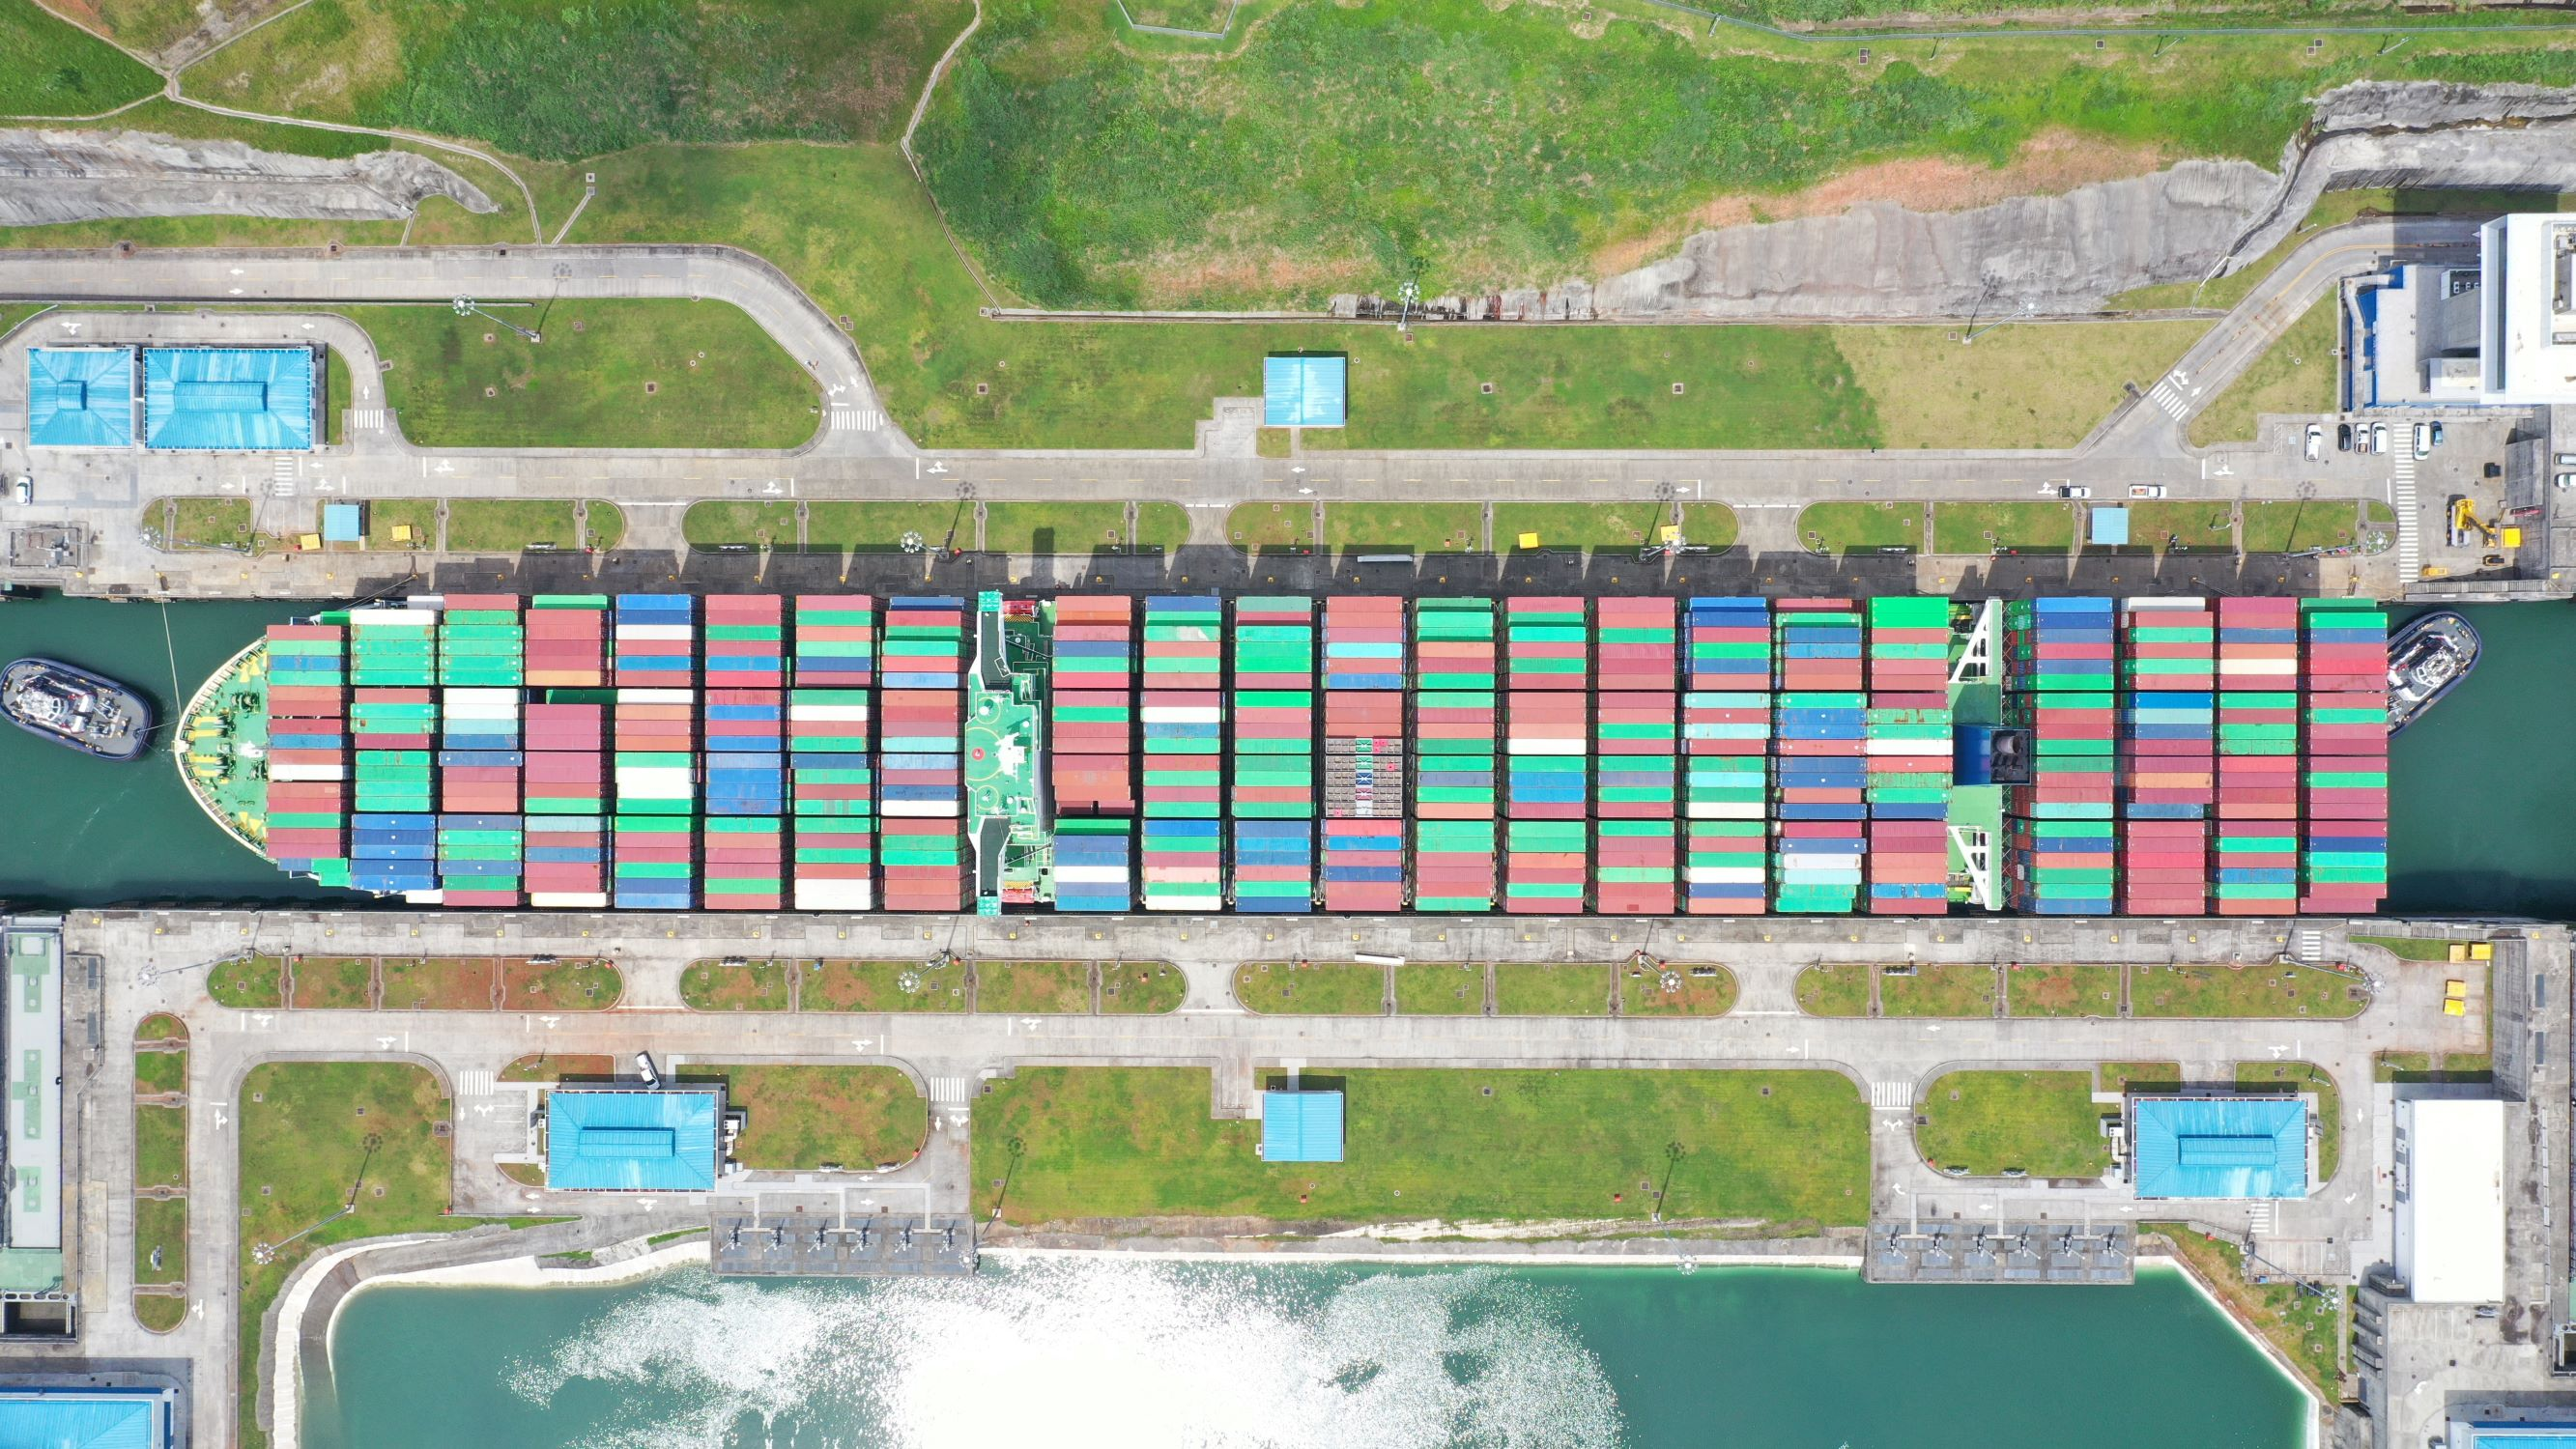 C/V Thalassa Elpida transiting the Panama Canal